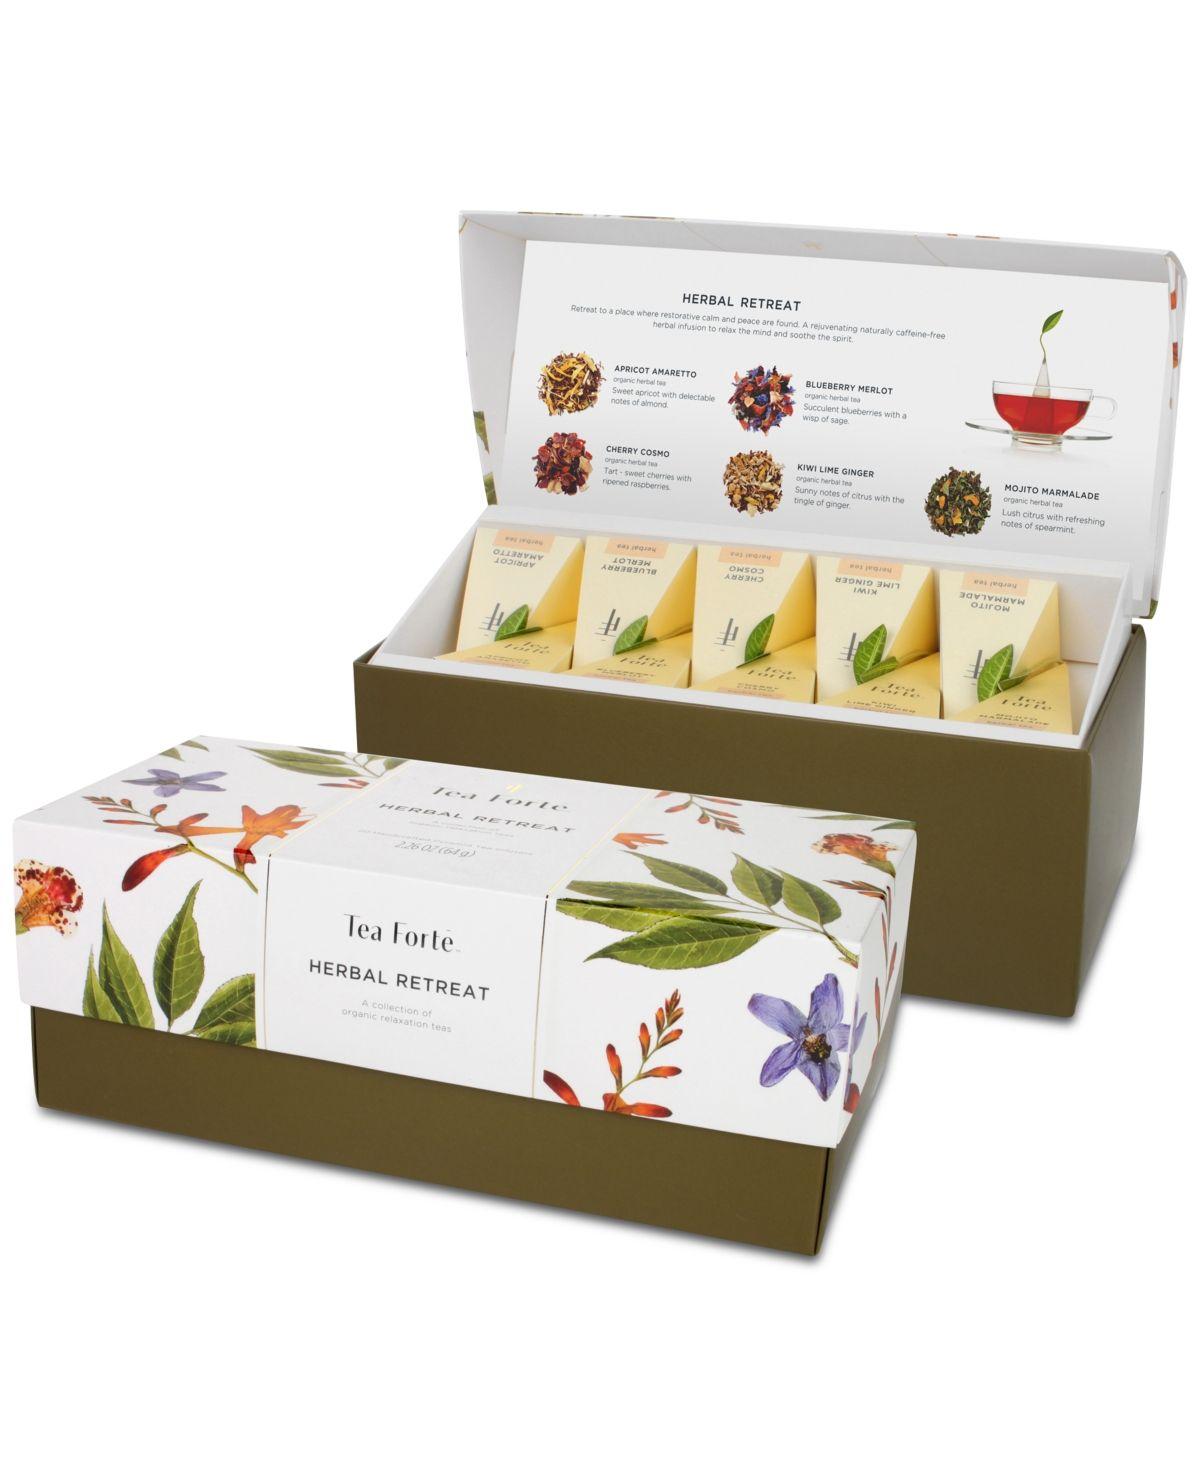 Assorted Variety Tea Box Tea Forte Warming Joy Petite Presentation Box Tea Sampler Gift Set 10 Handcrafted Pyramid Tea Infuser Bags with Black Tea and Herbal Tea Winter Holiday Blends